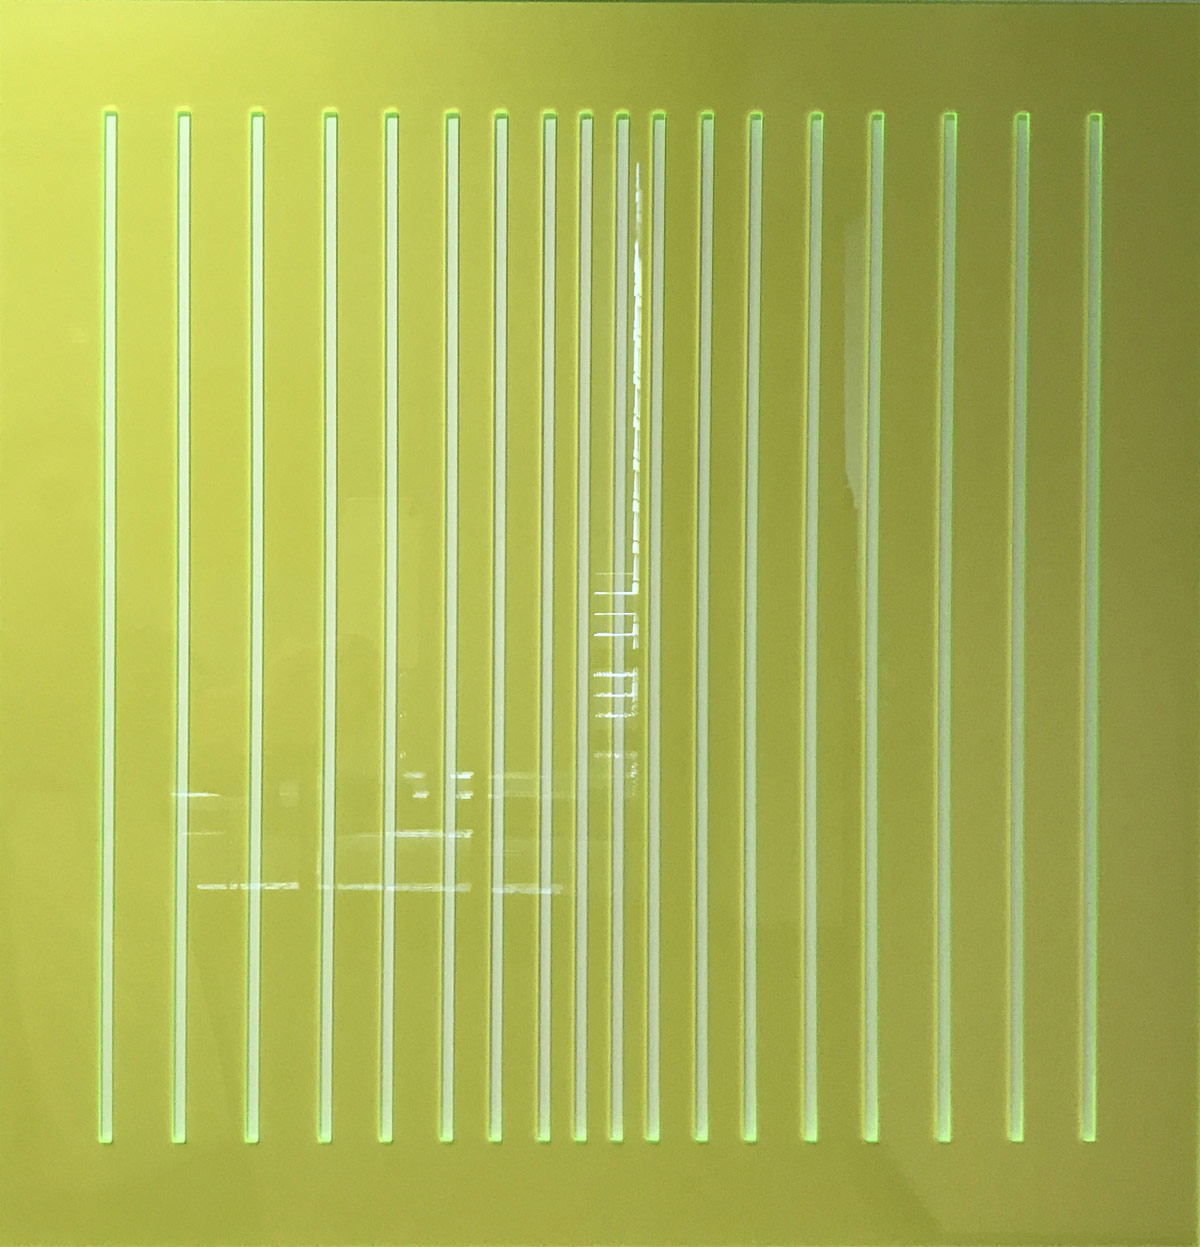 Ina von Jan Konkrete Kunst Phase III Acrylglas